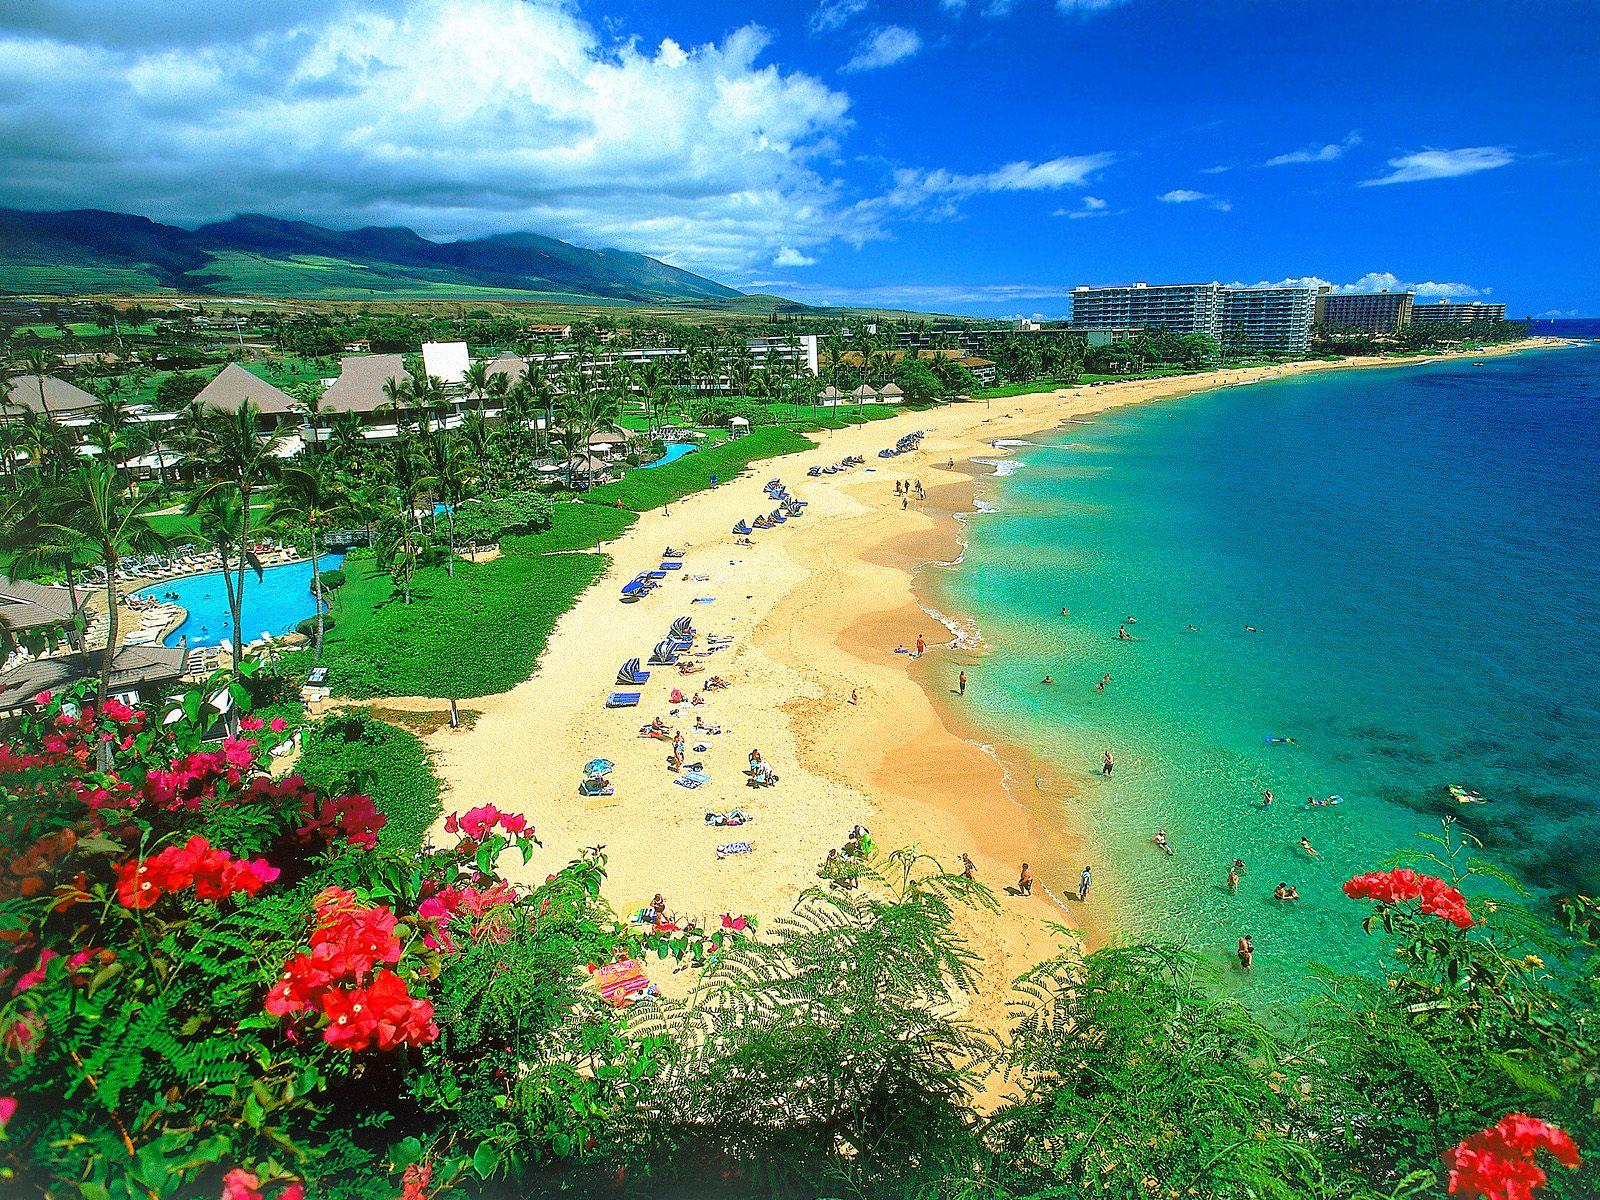 Kaanapali Beach Maui Hawaii wallpaper 1600x1200